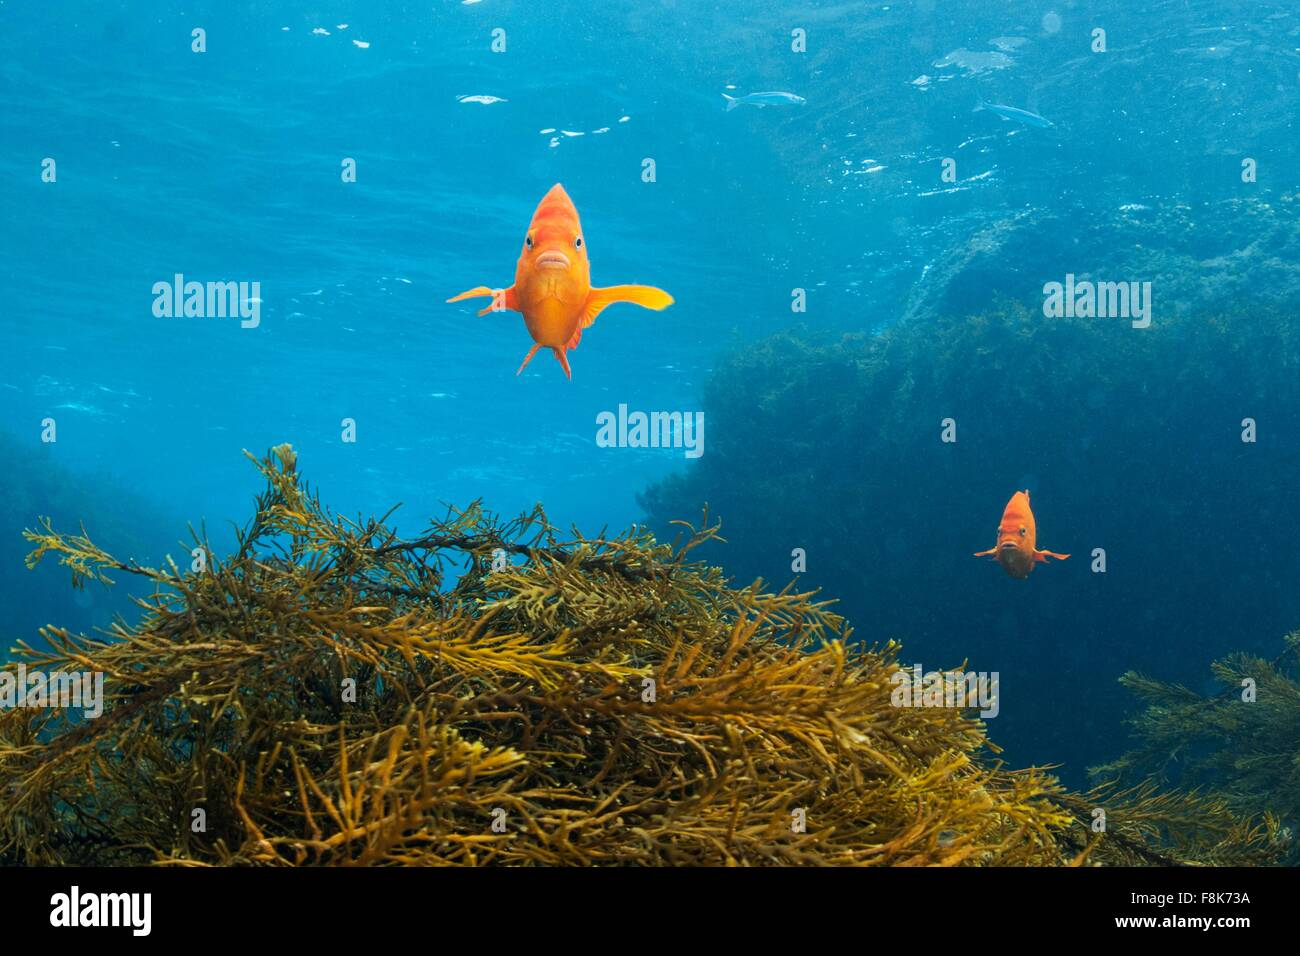 Front view of garibaldi fish over kelp reef, Guadalupe Island, Baja California, Mexico - Stock Image